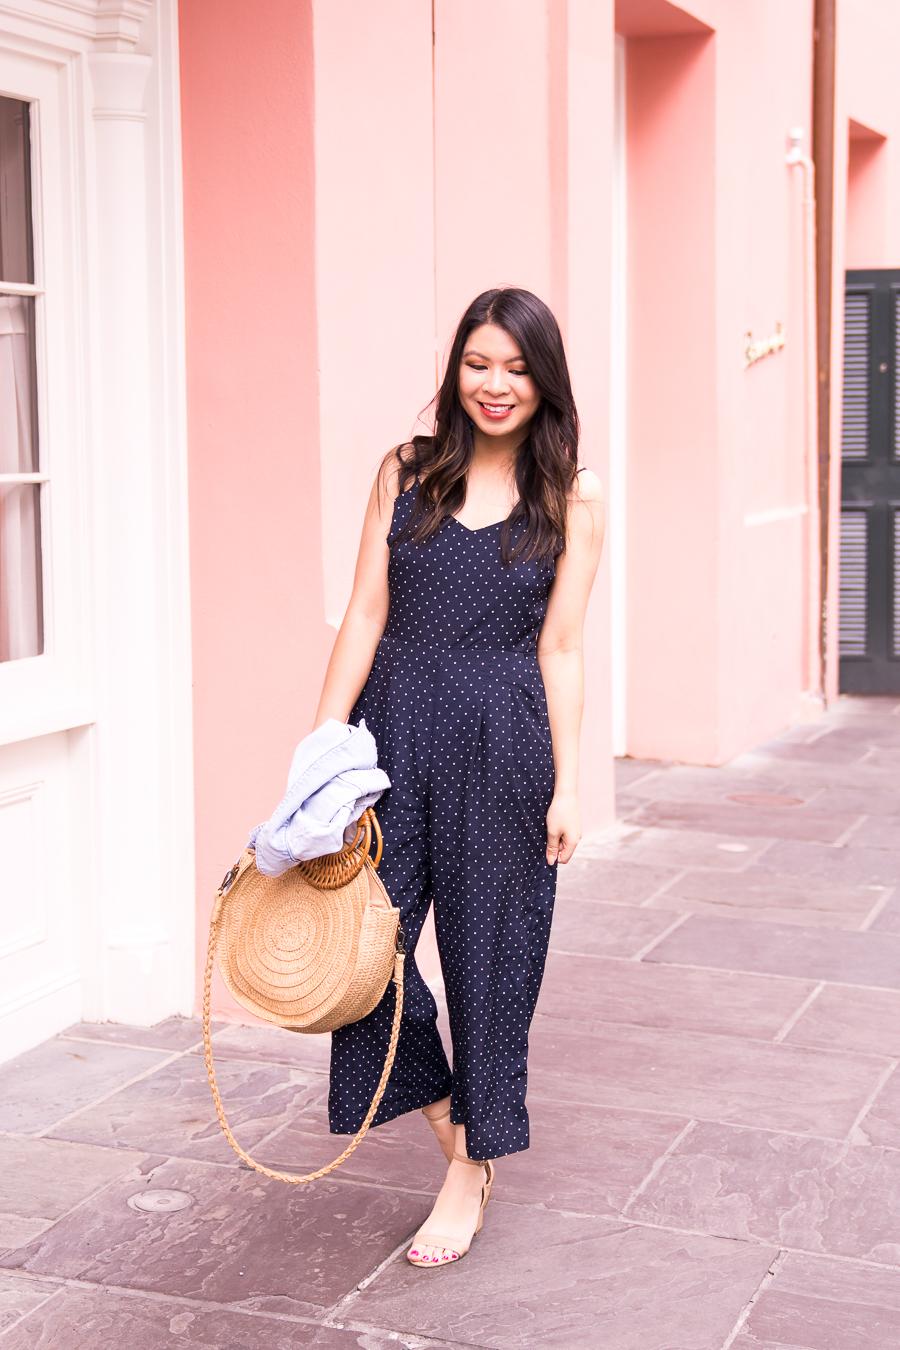 7188df62396 Just A Tina Bit fashion blogger wearing a navy polka dot jumpsuit